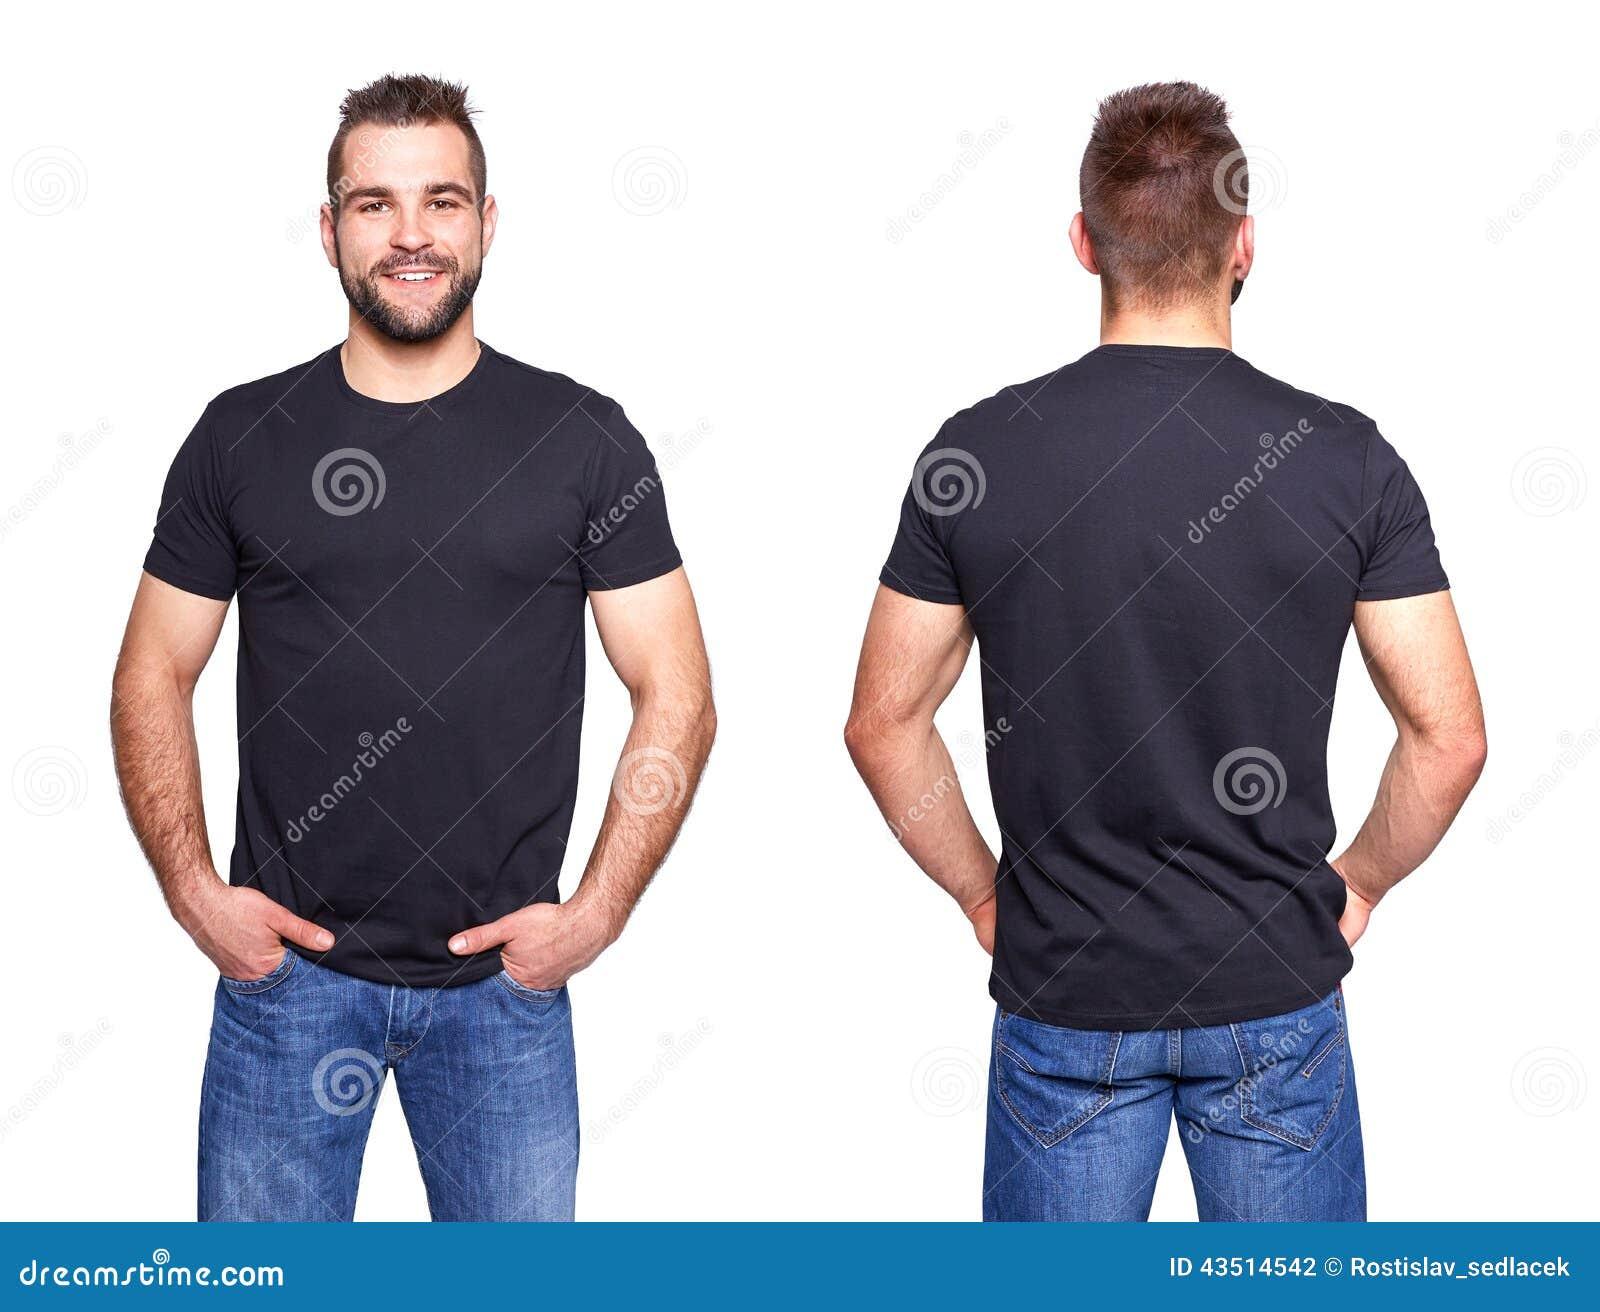 Camiseta negra en una plantilla del hombre joven